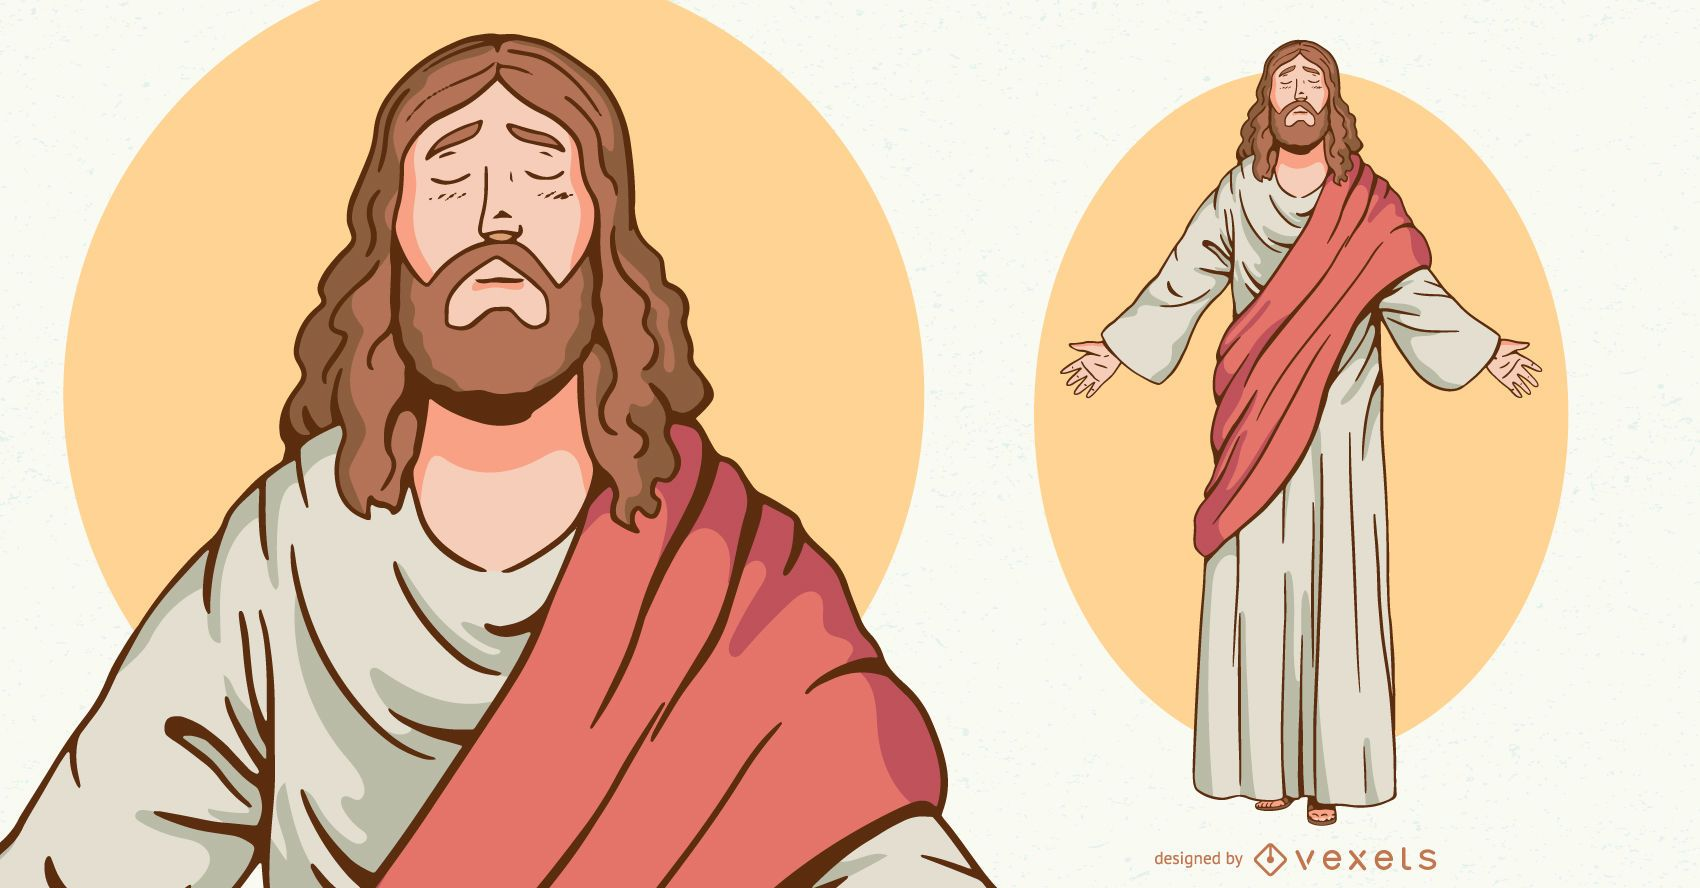 Jesus character illustration